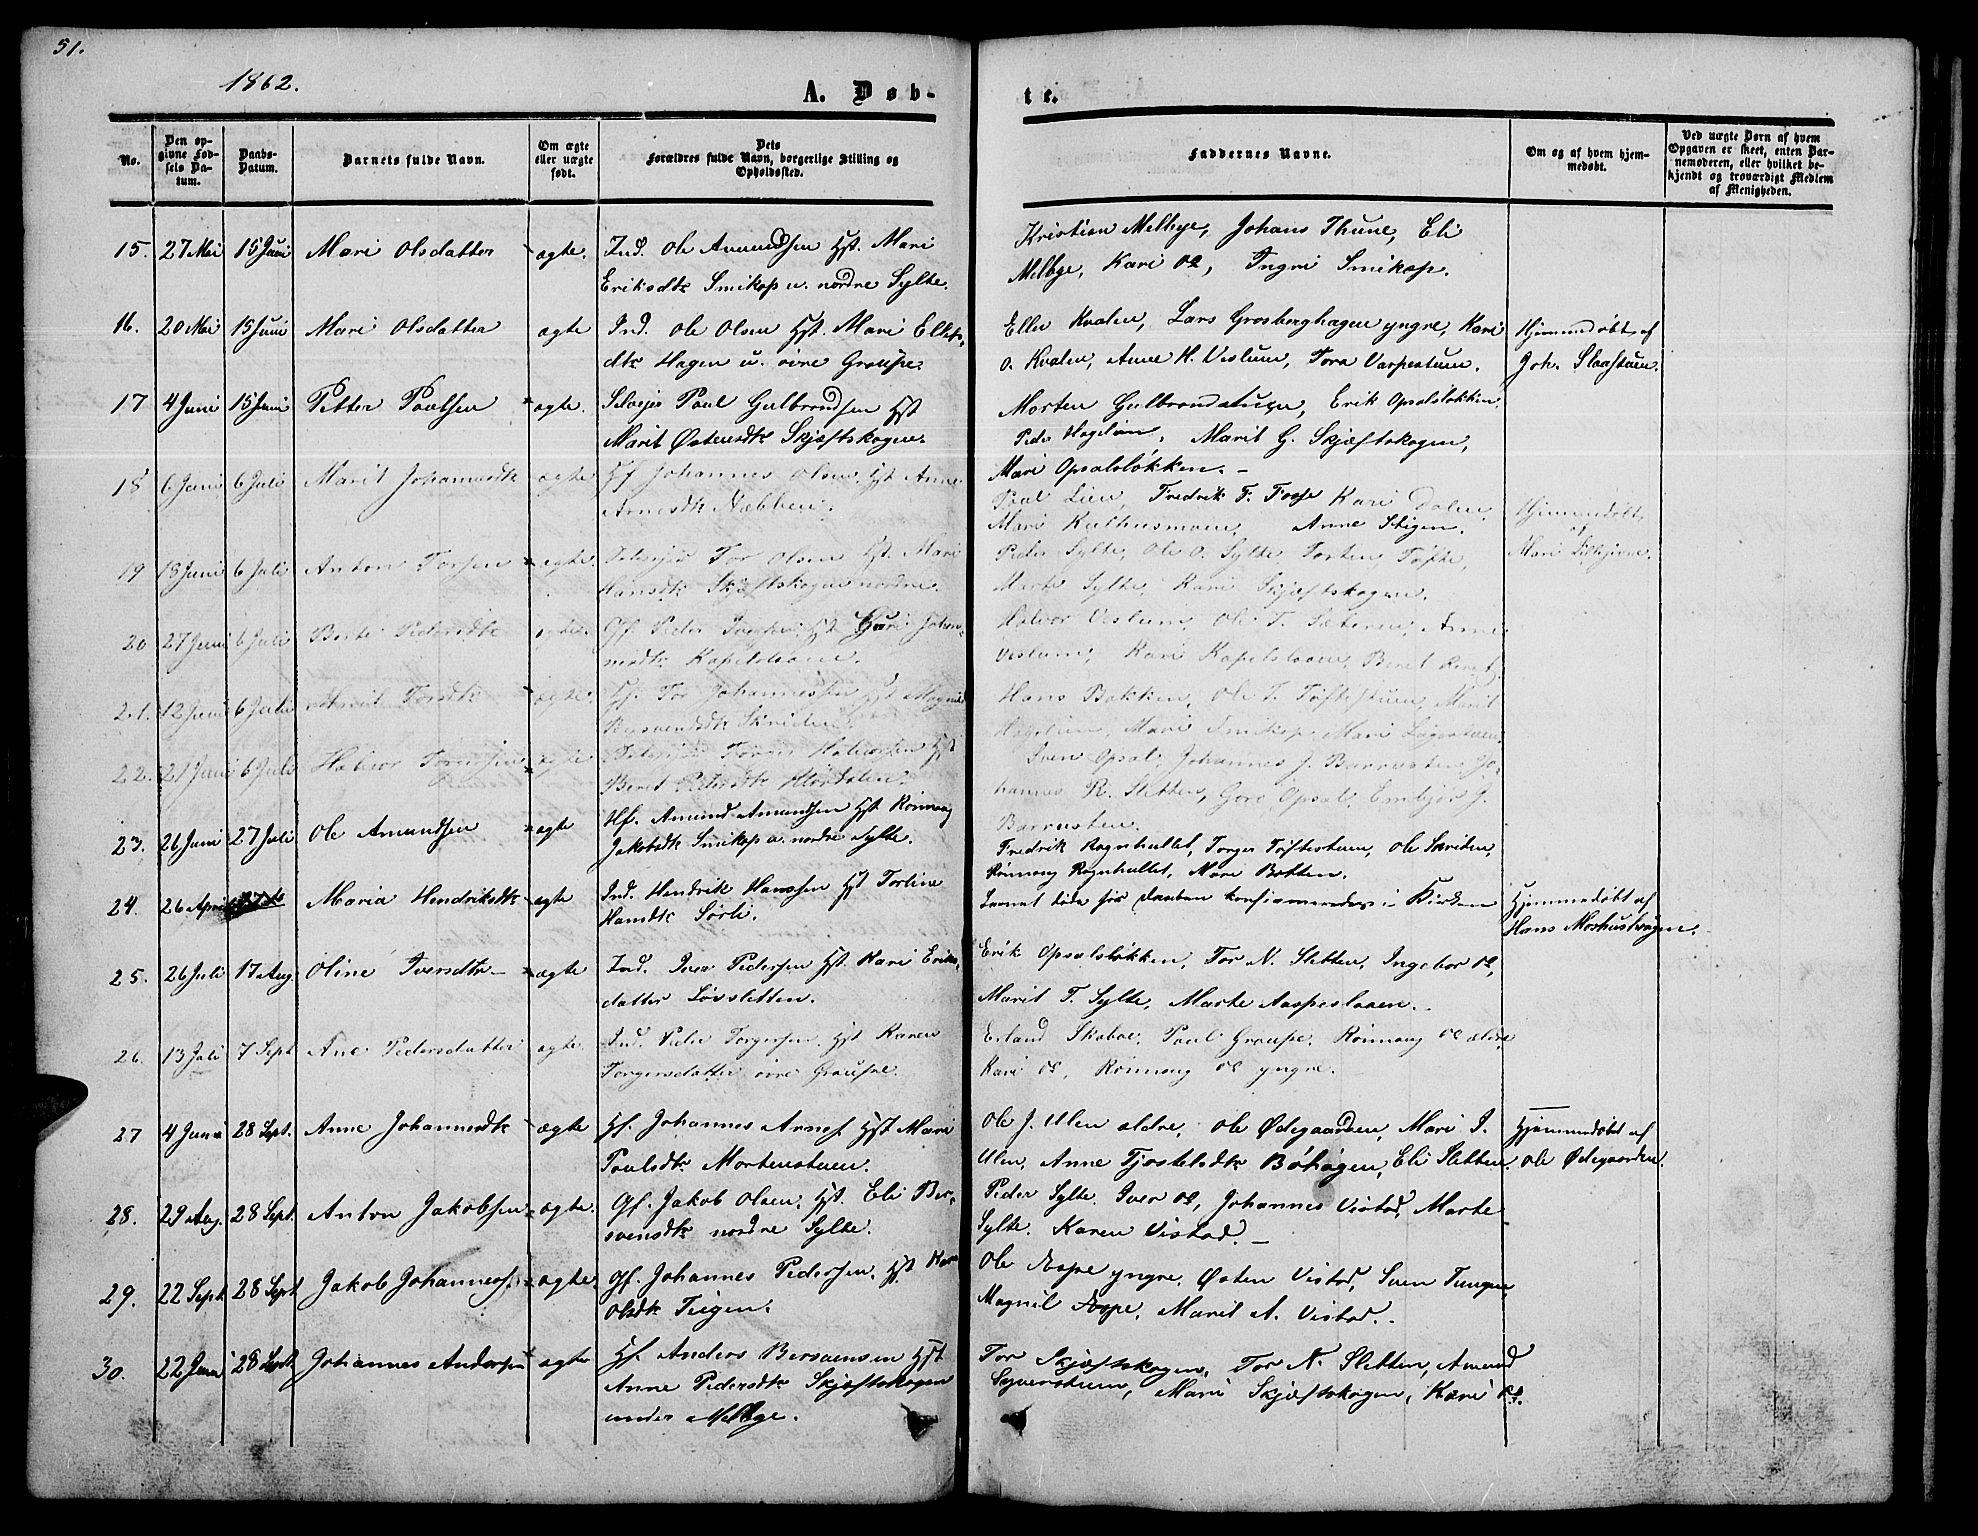 SAH, Nord-Fron prestekontor, Klokkerbok nr. 2, 1851-1883, s. 51